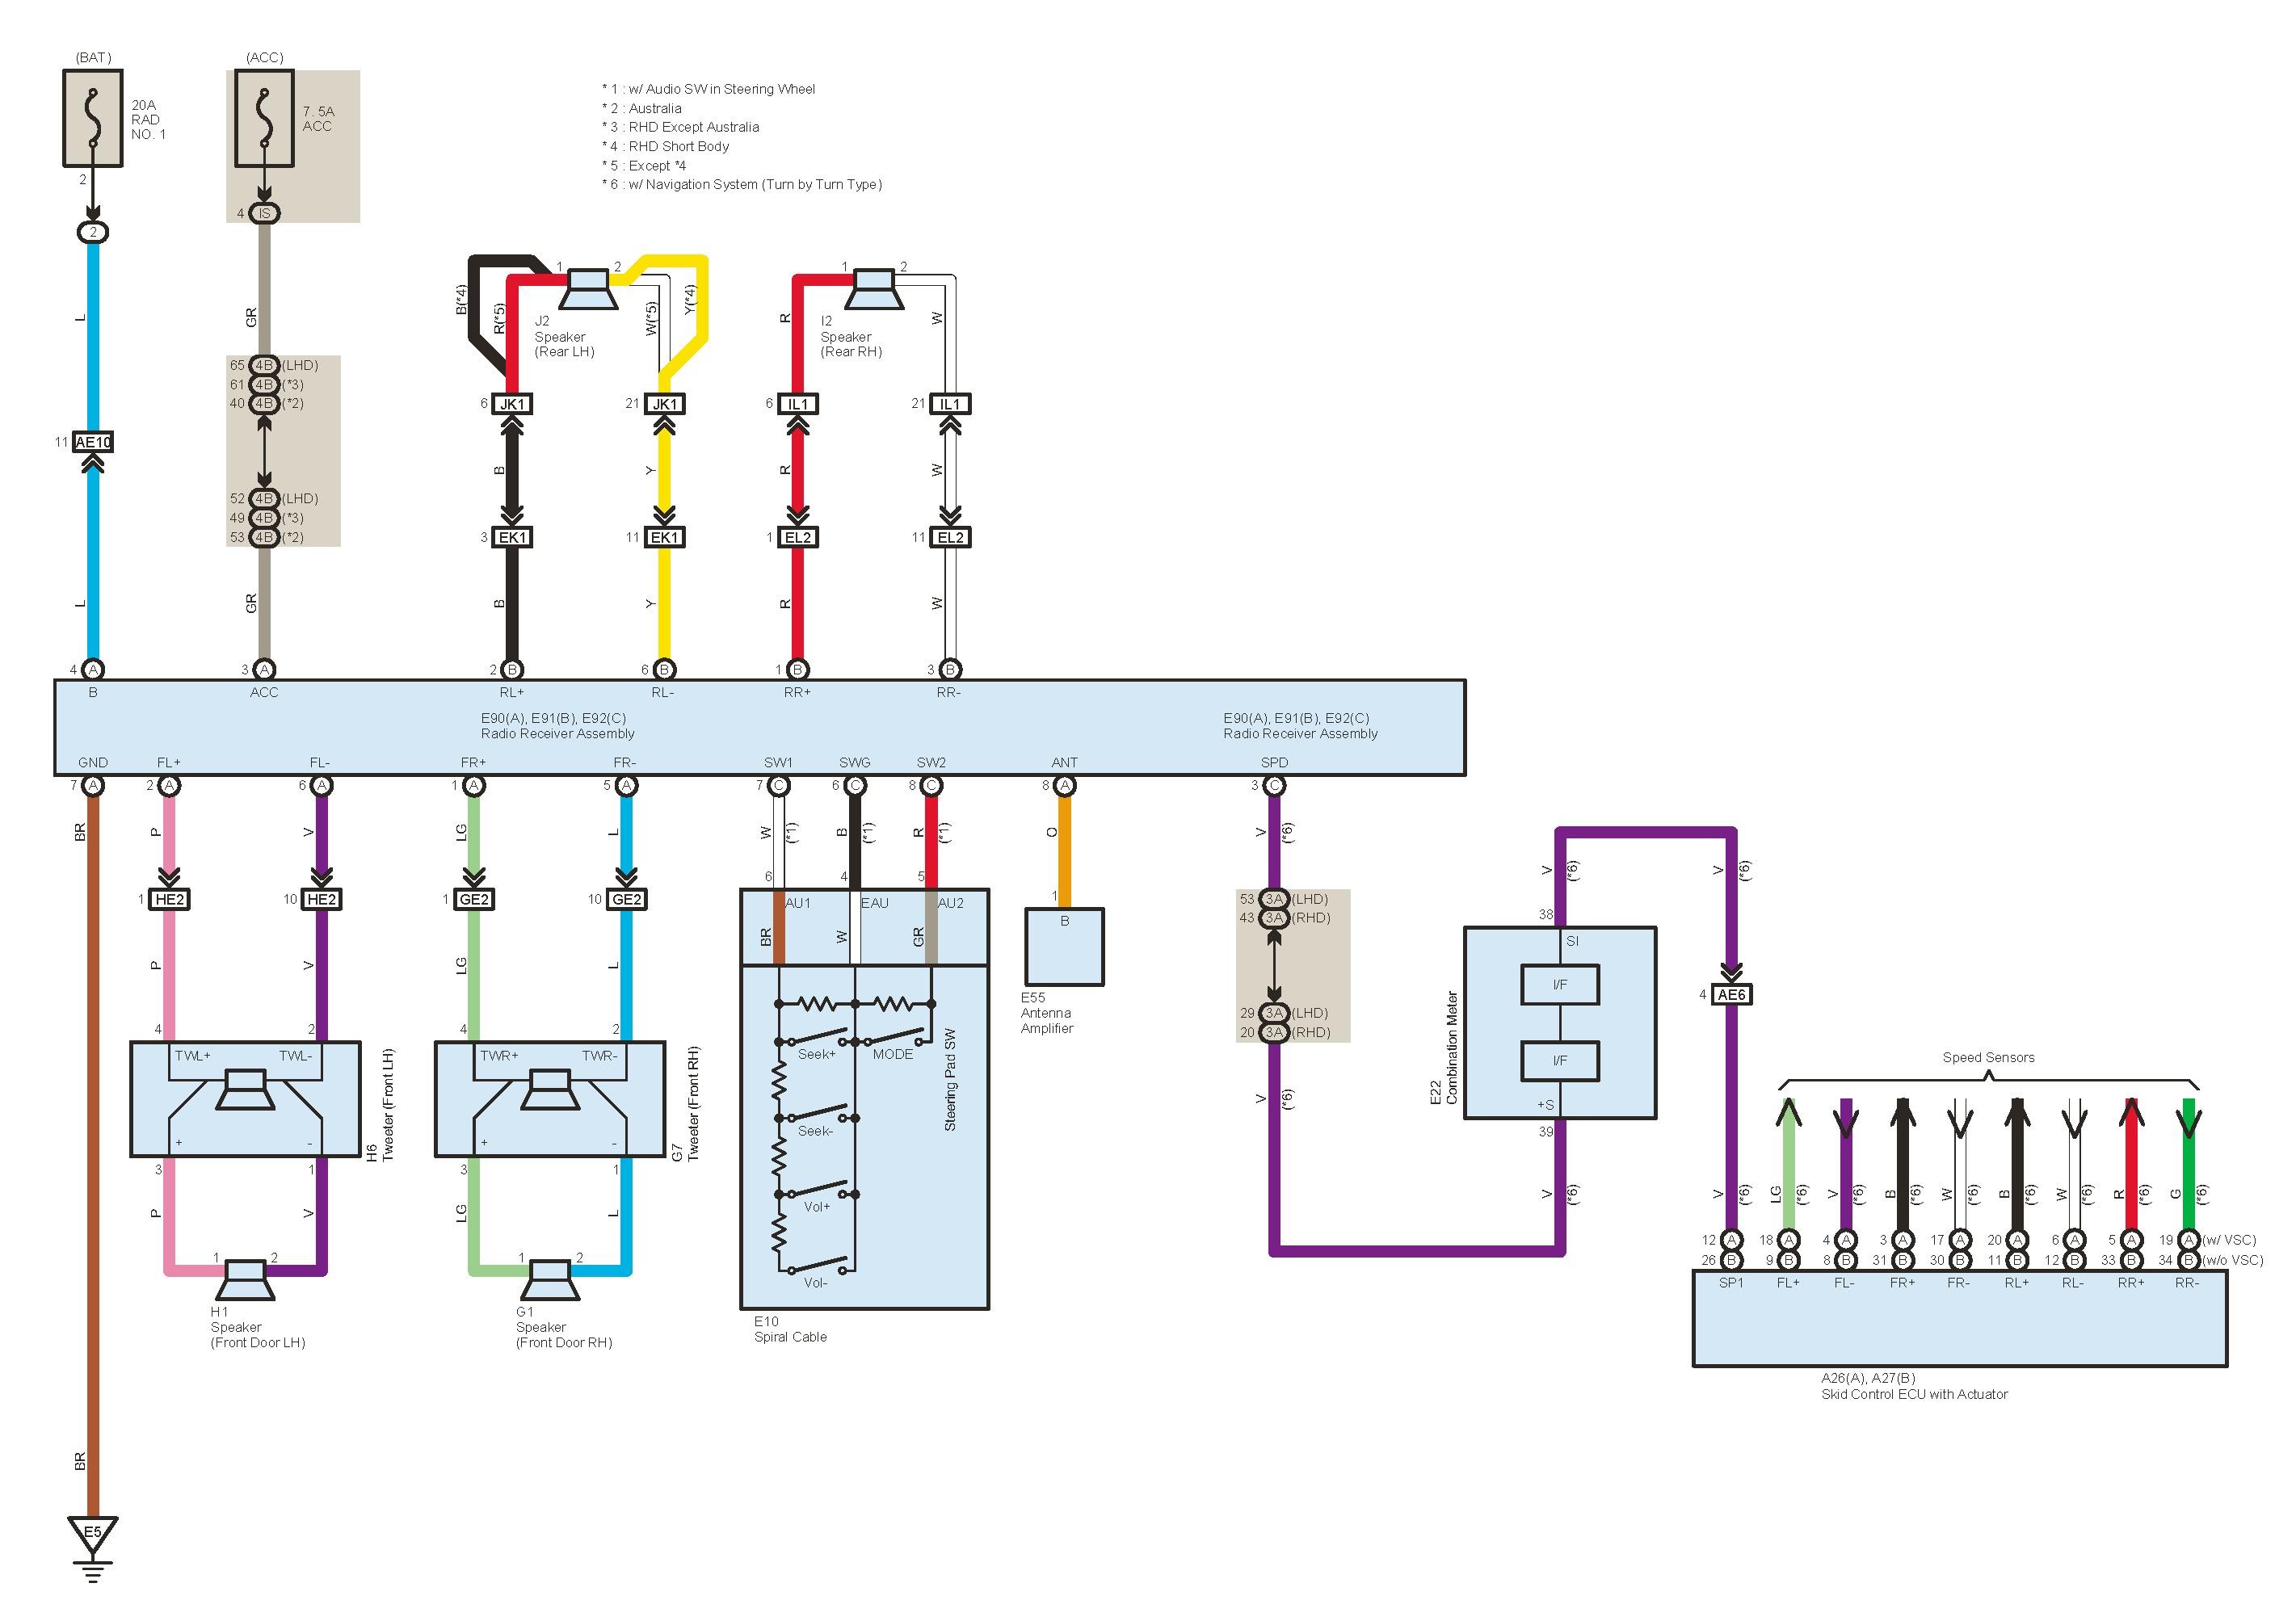 370z Aftermarket Wiring Diagram For 2011 - Wiring Diagram ...